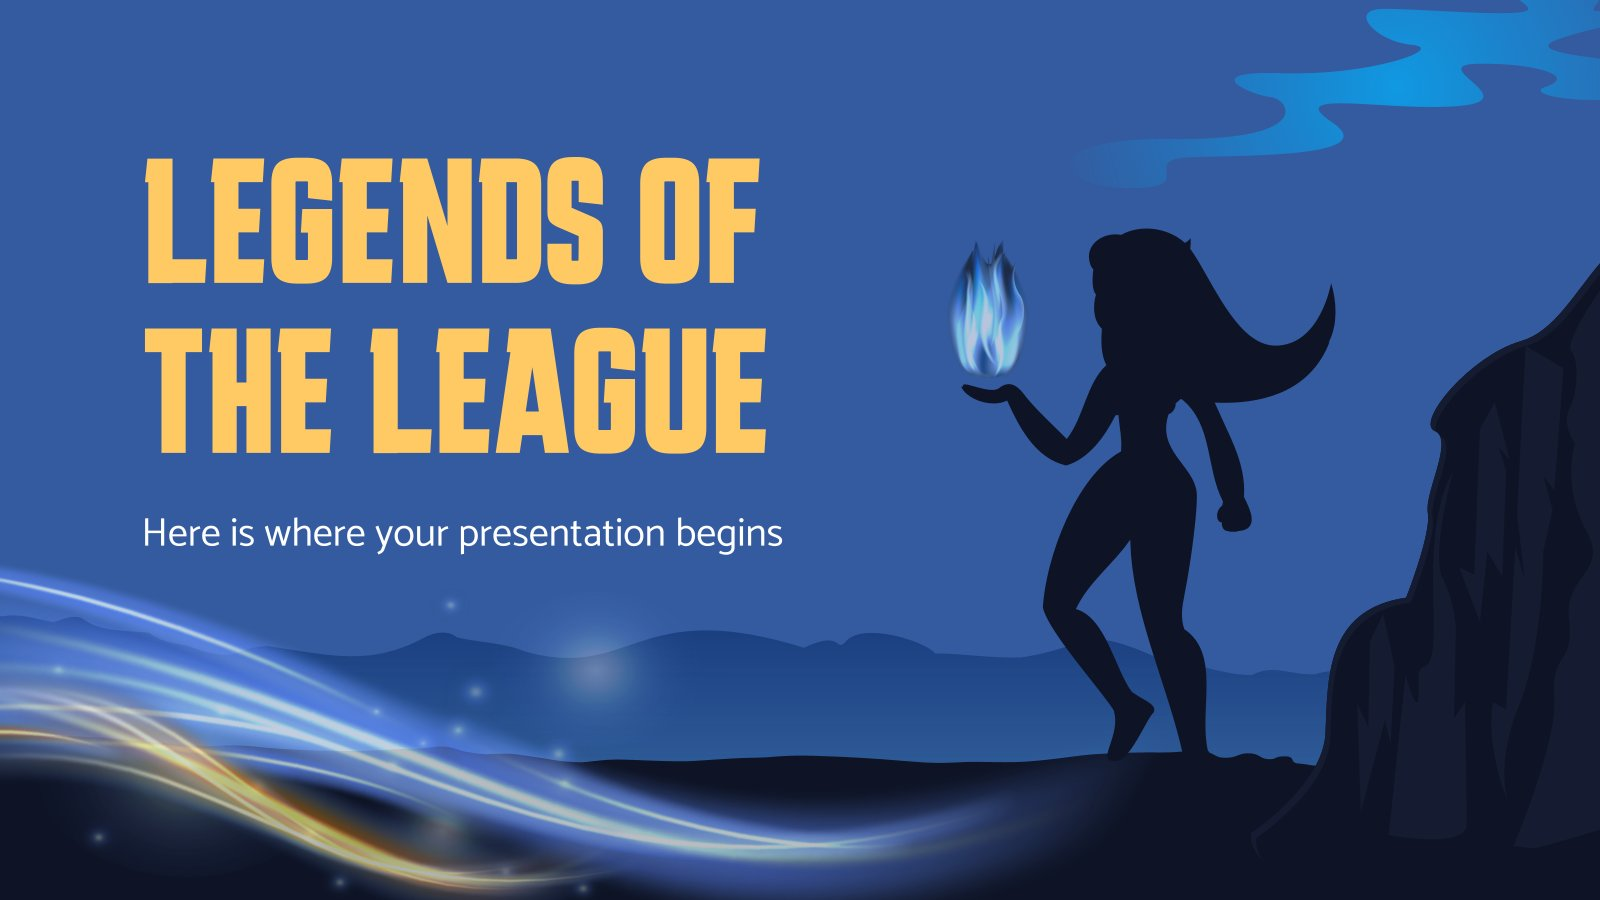 Legends Of The League presentation template